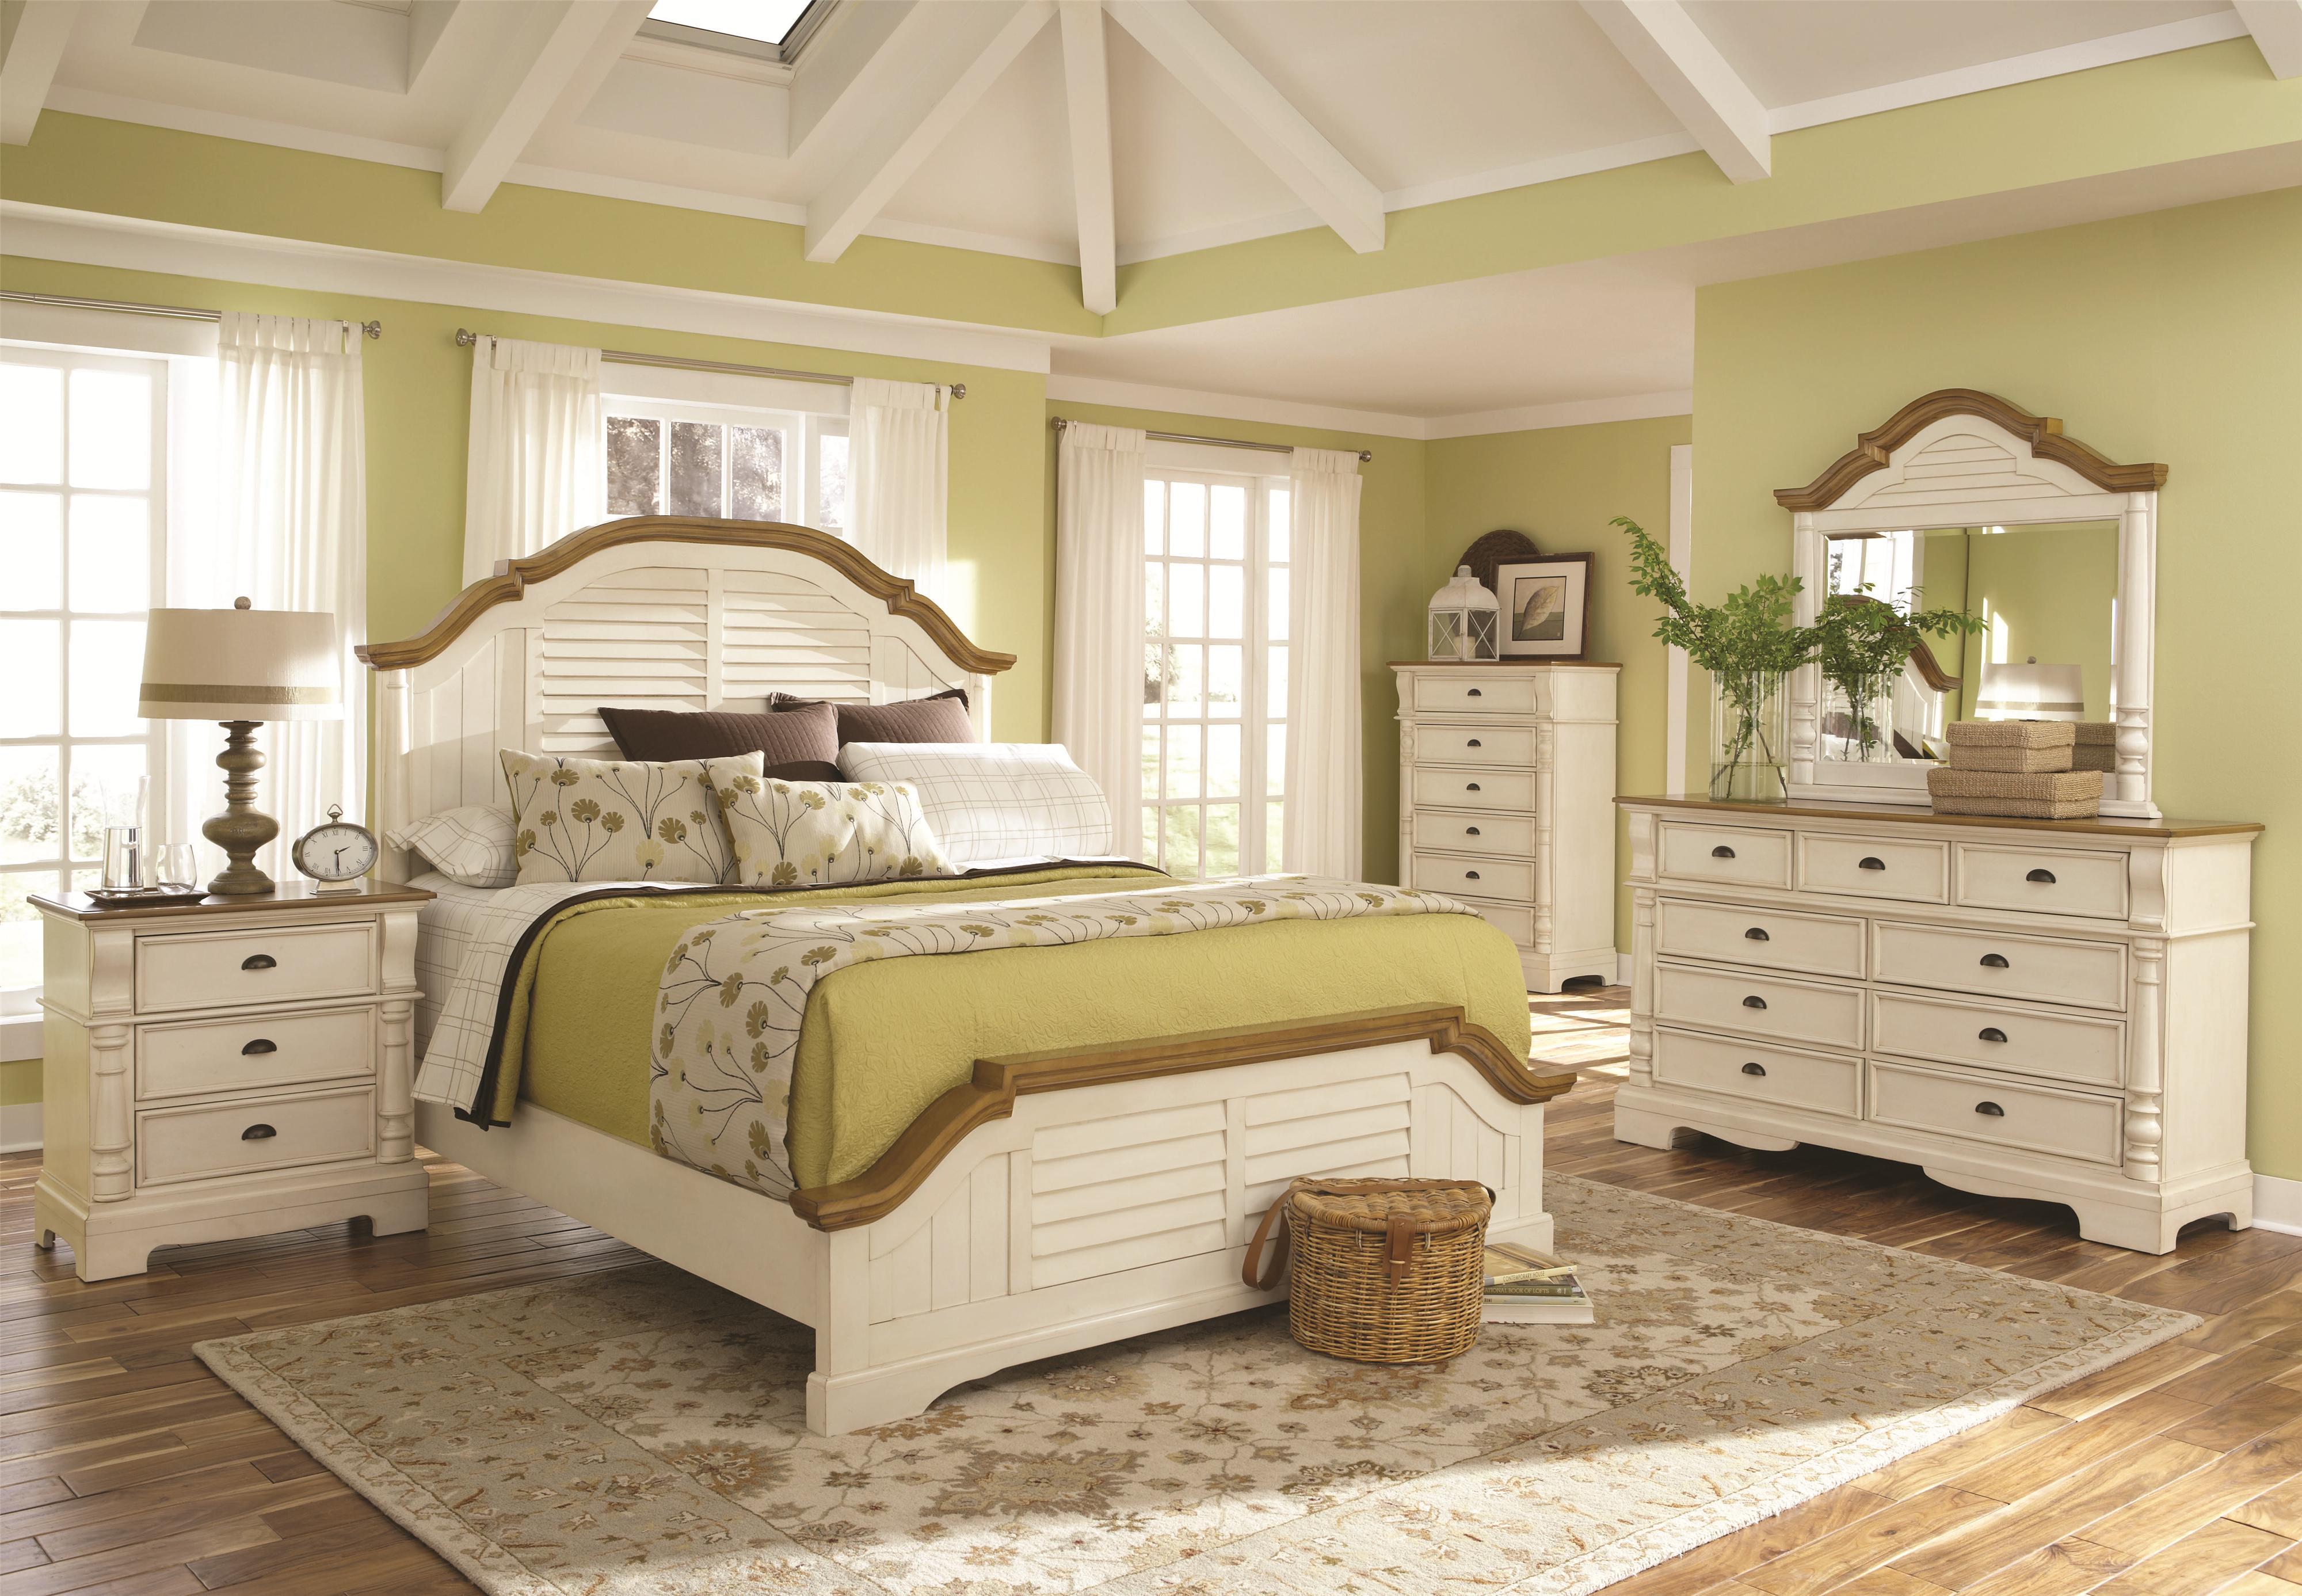 California King Bedroom Group Item Number 20288 CK Bedroom Group 1